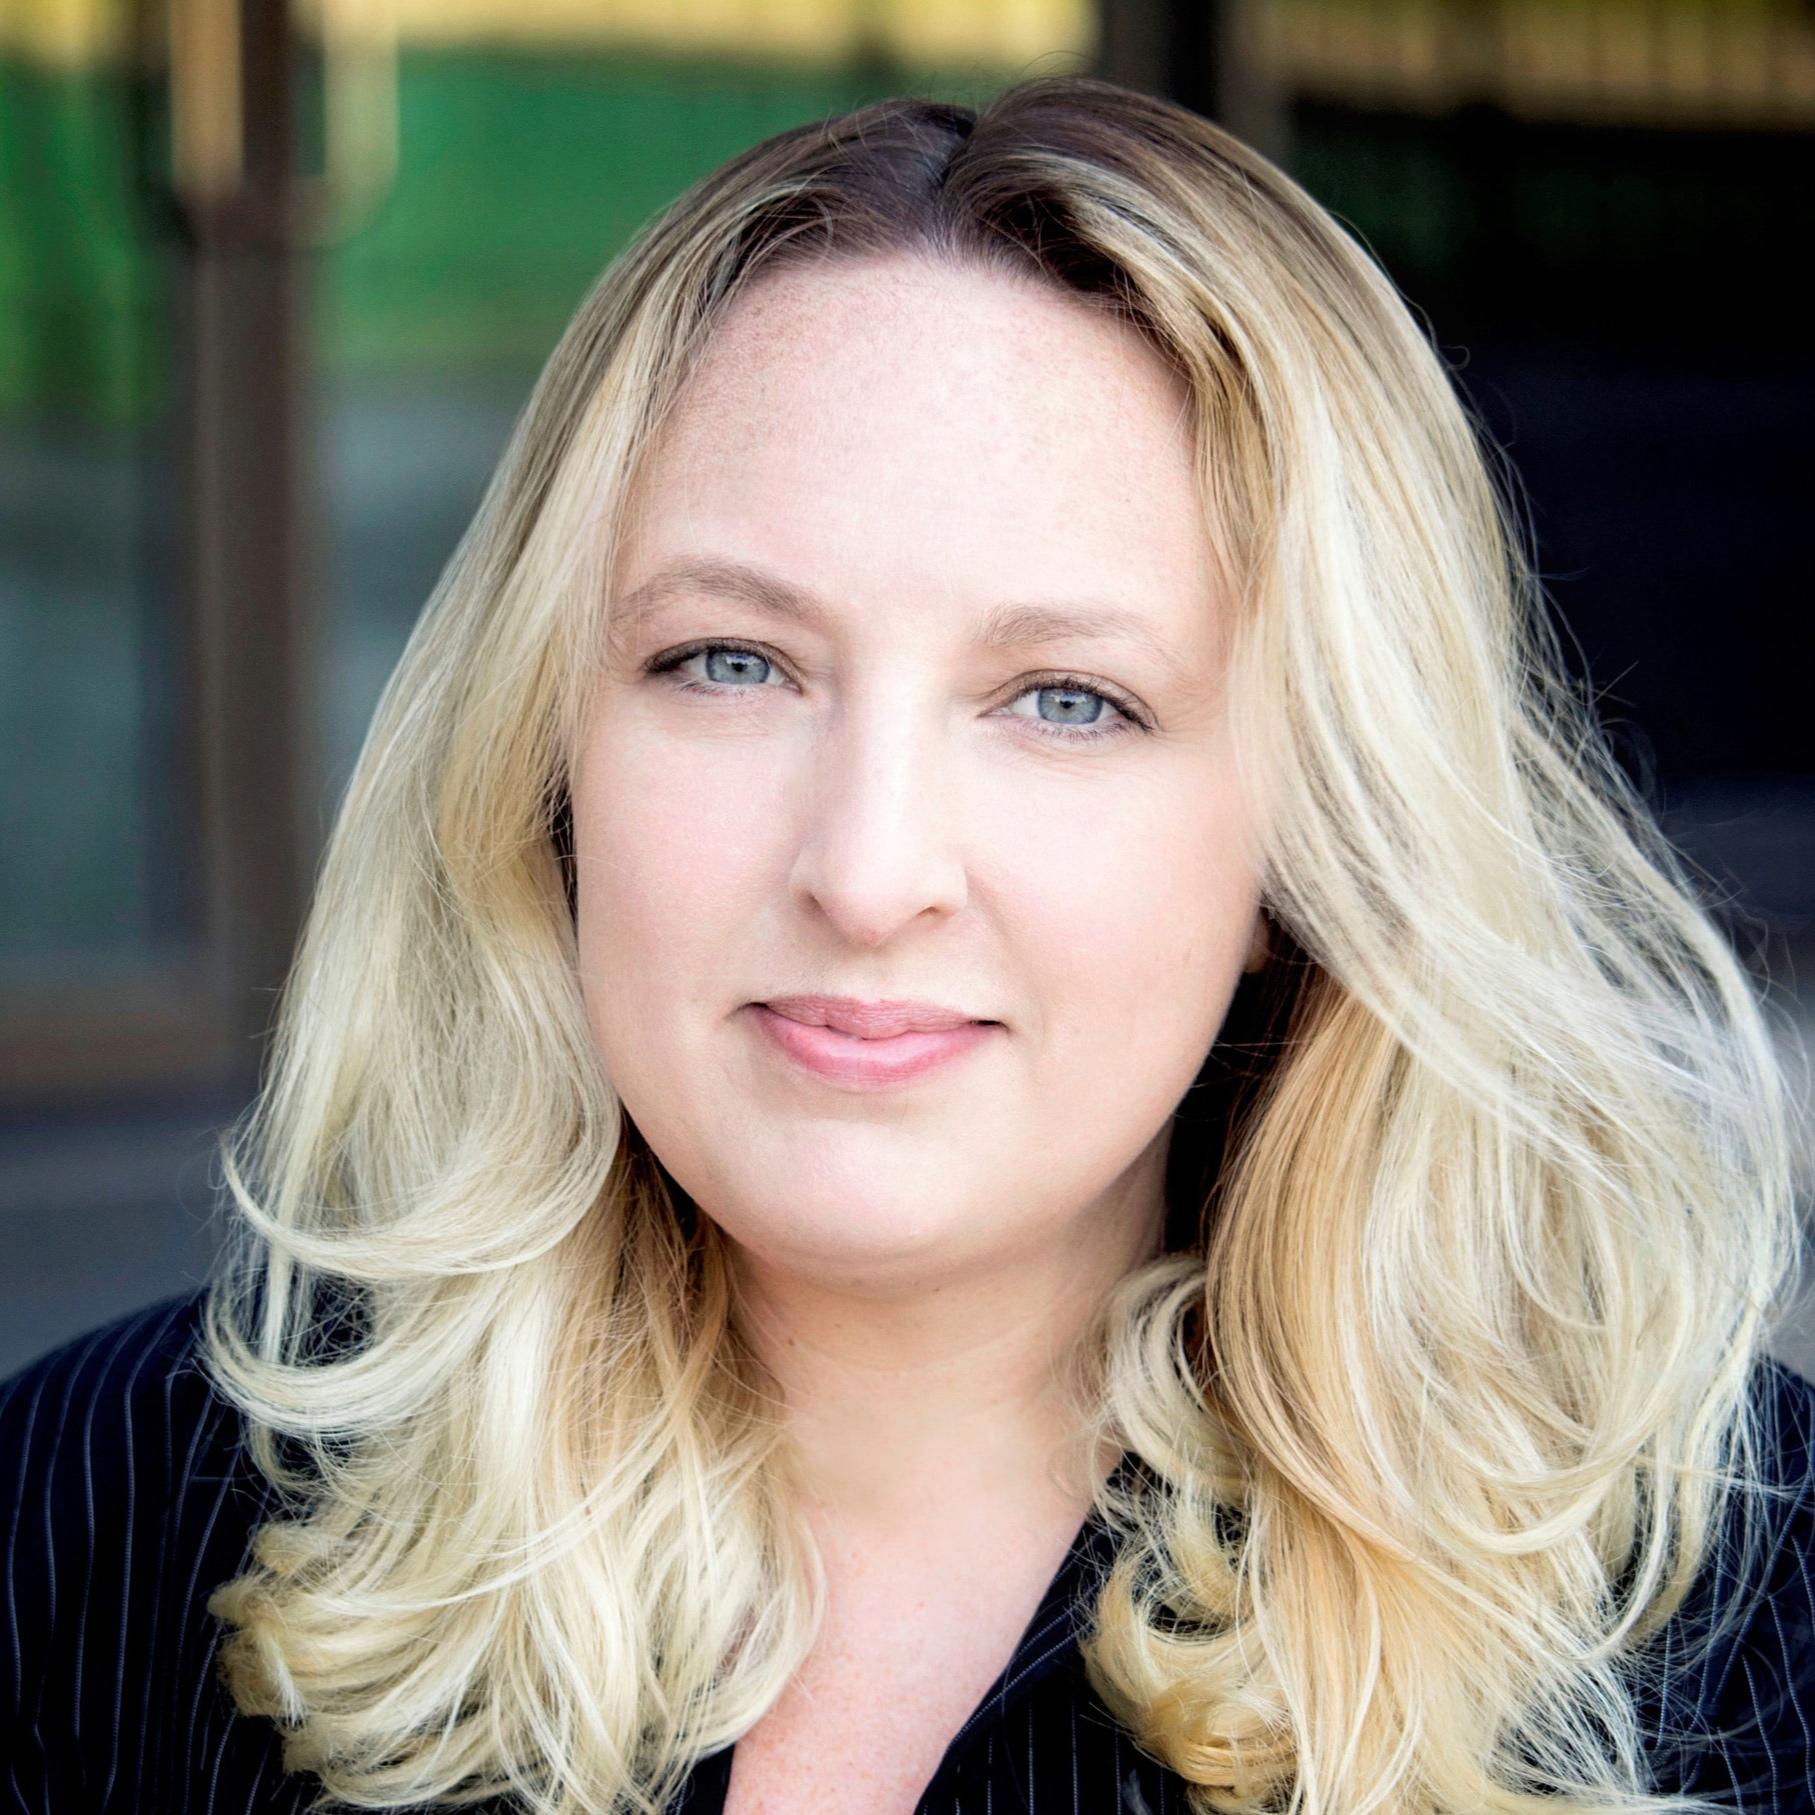 Jessica Urwin - Executive Assistant& Team Optimization